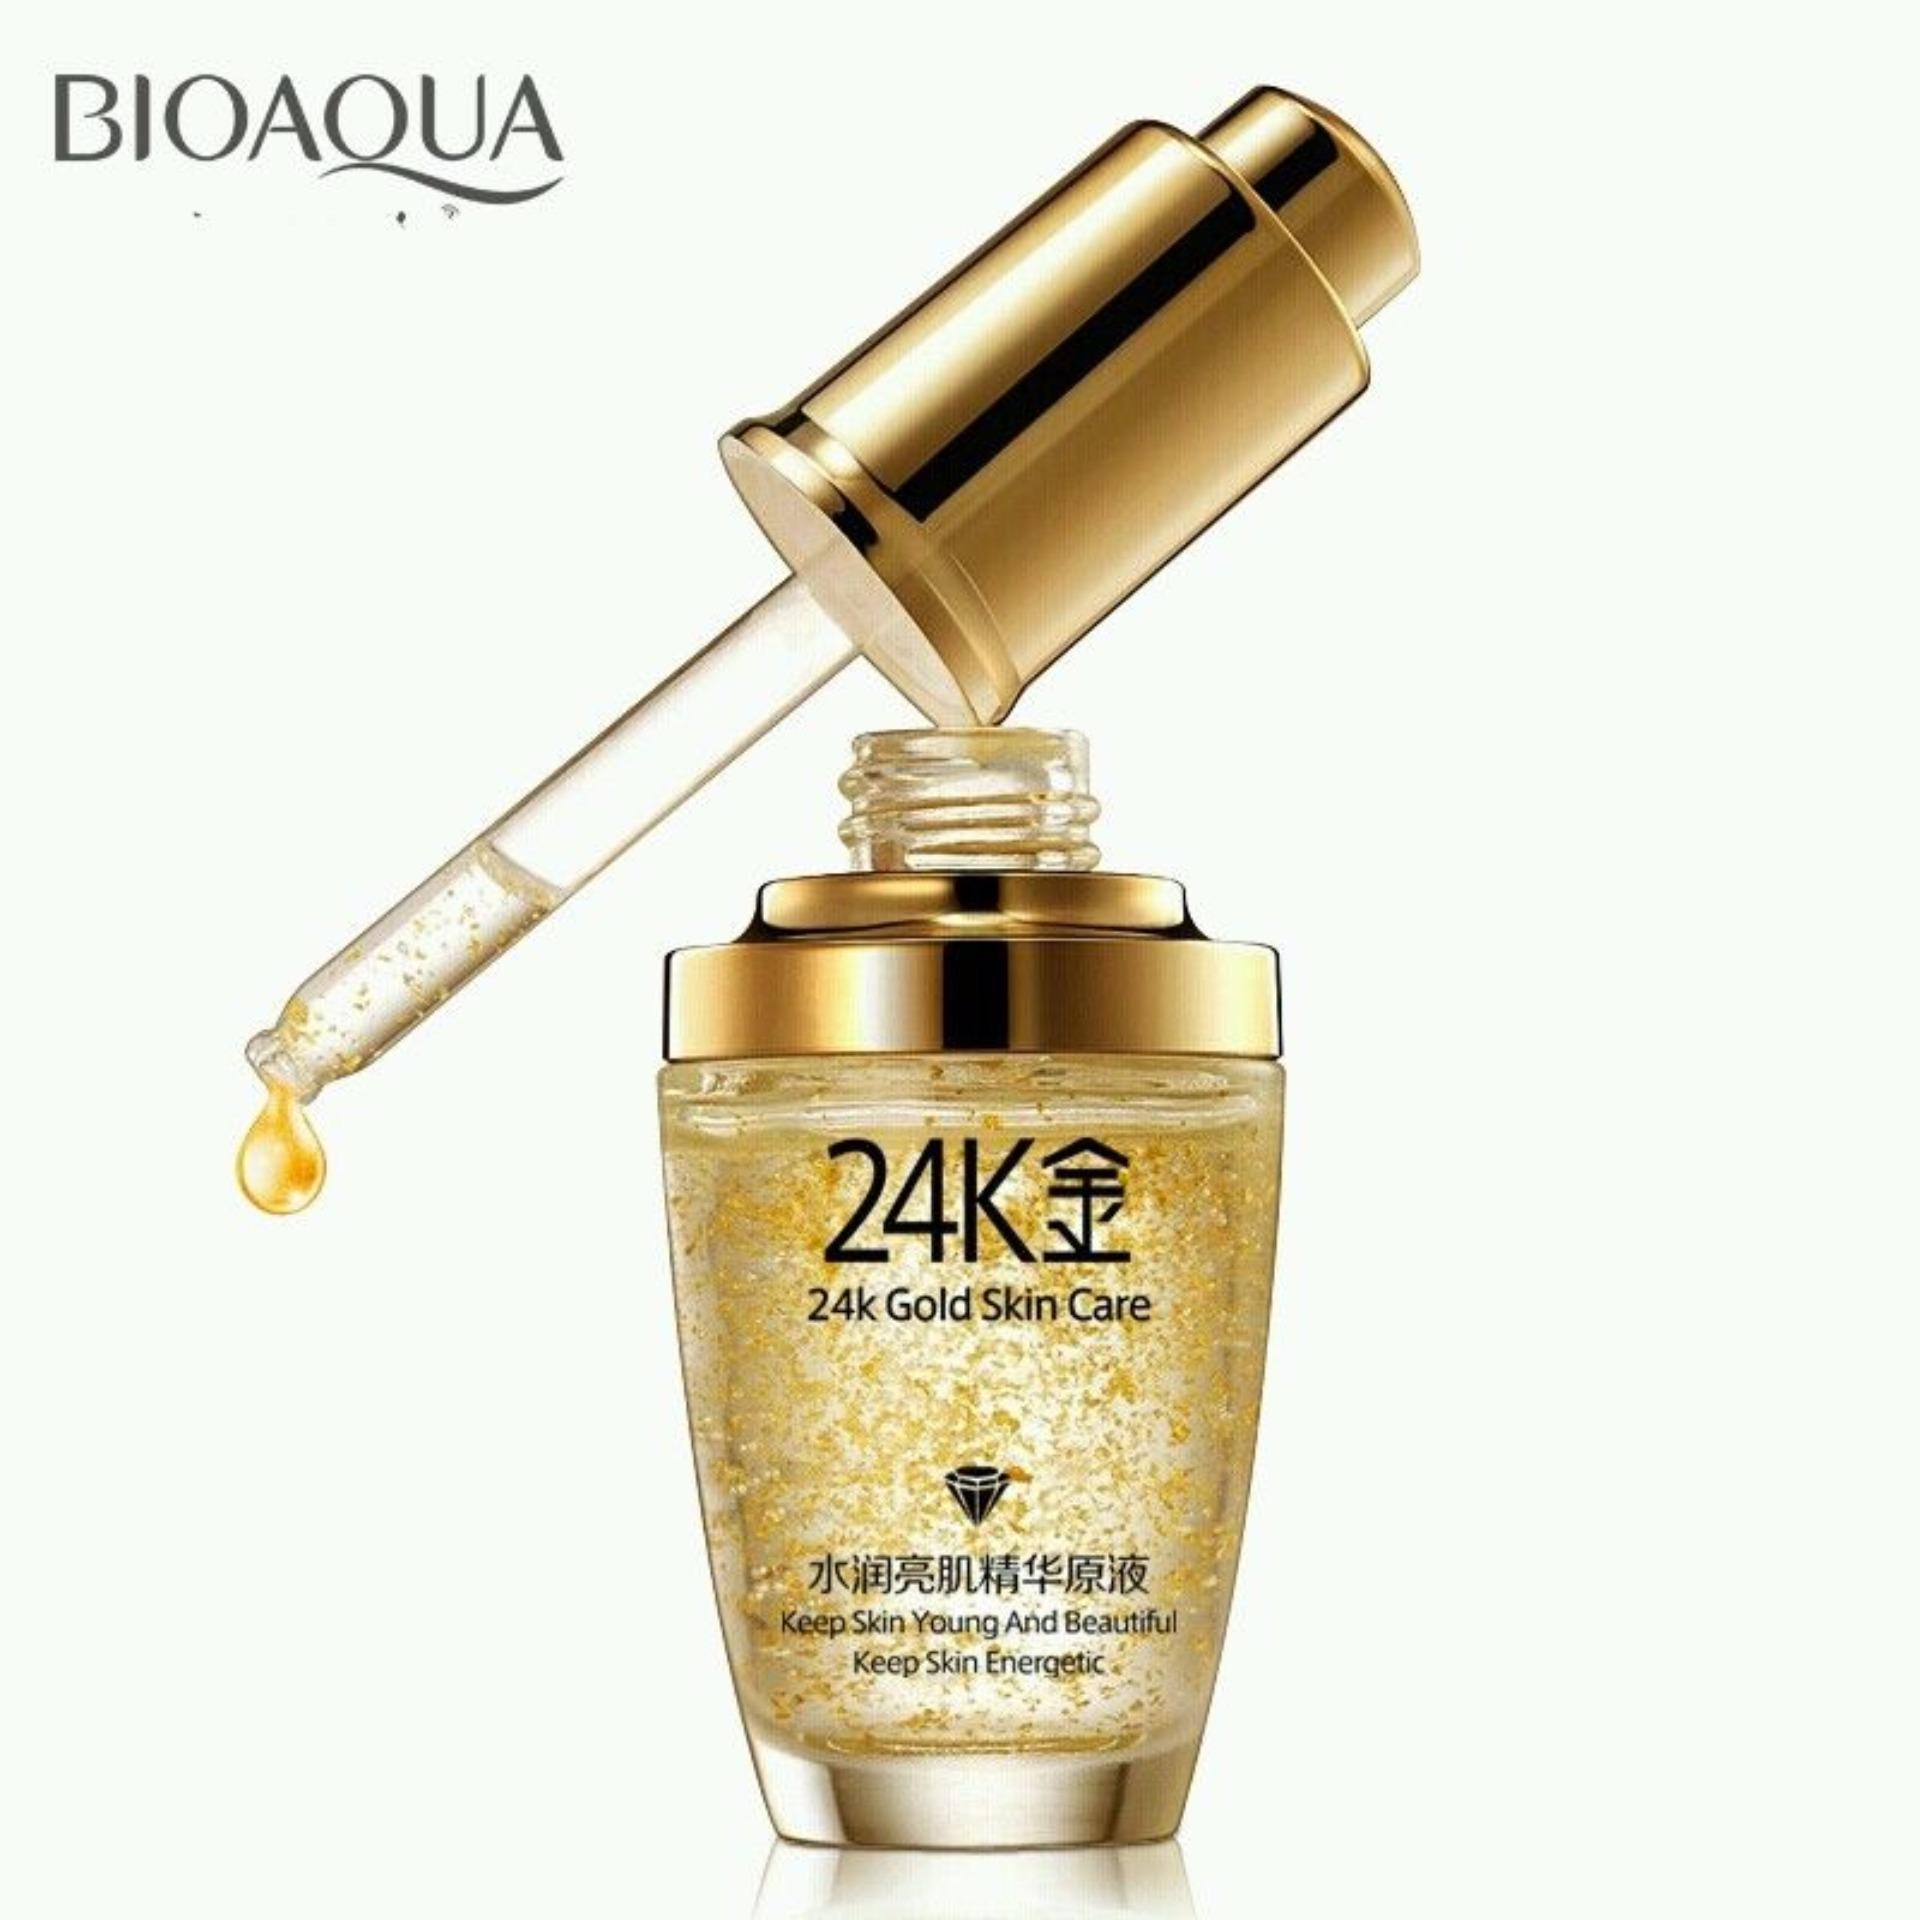 Tinh Chất Dưỡng Da Chuyên Sâu Bioaqua 24K Skin Care